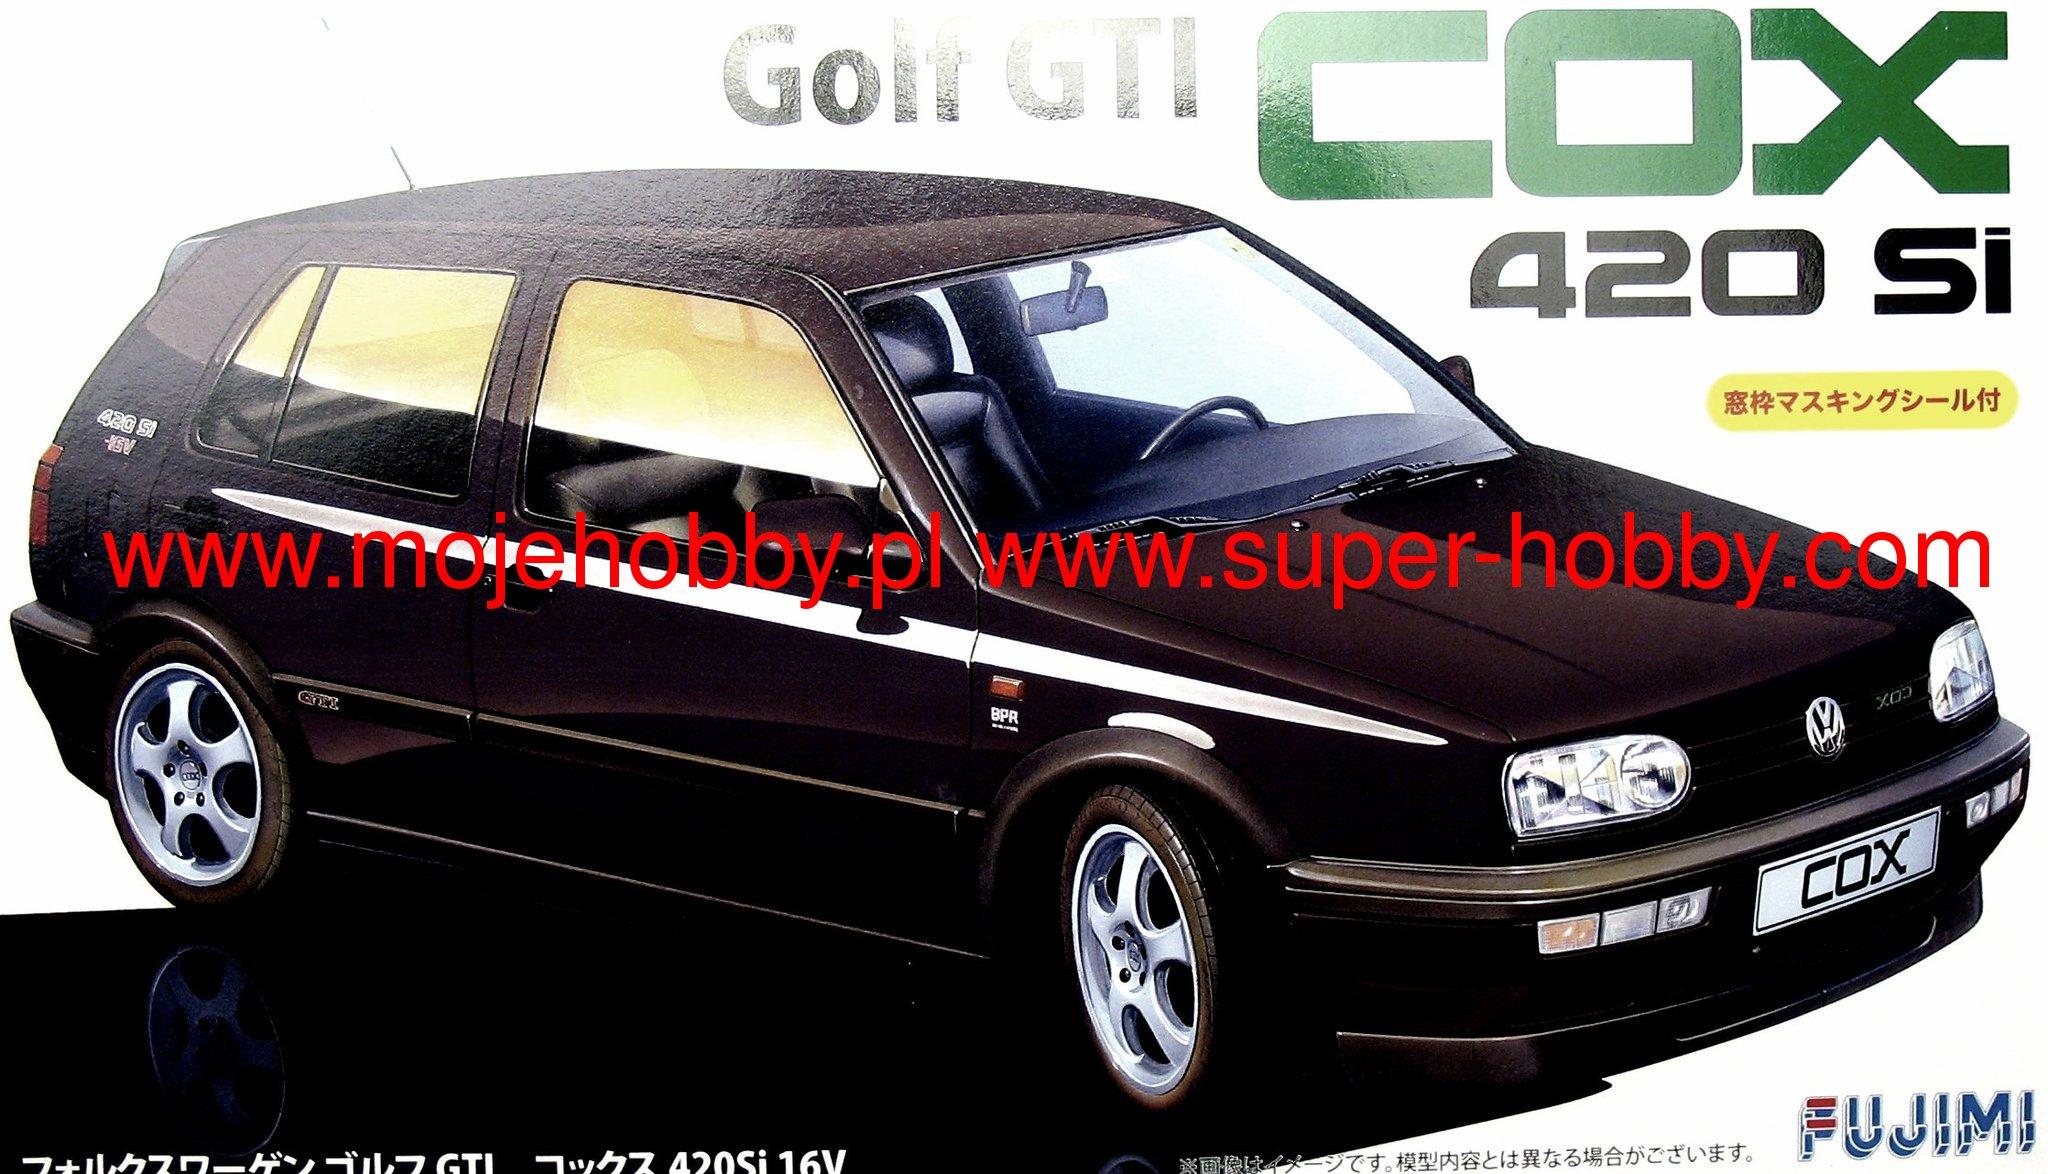 volkswagen golf iii gti cox 420si 16v fujimi 126180. Black Bedroom Furniture Sets. Home Design Ideas